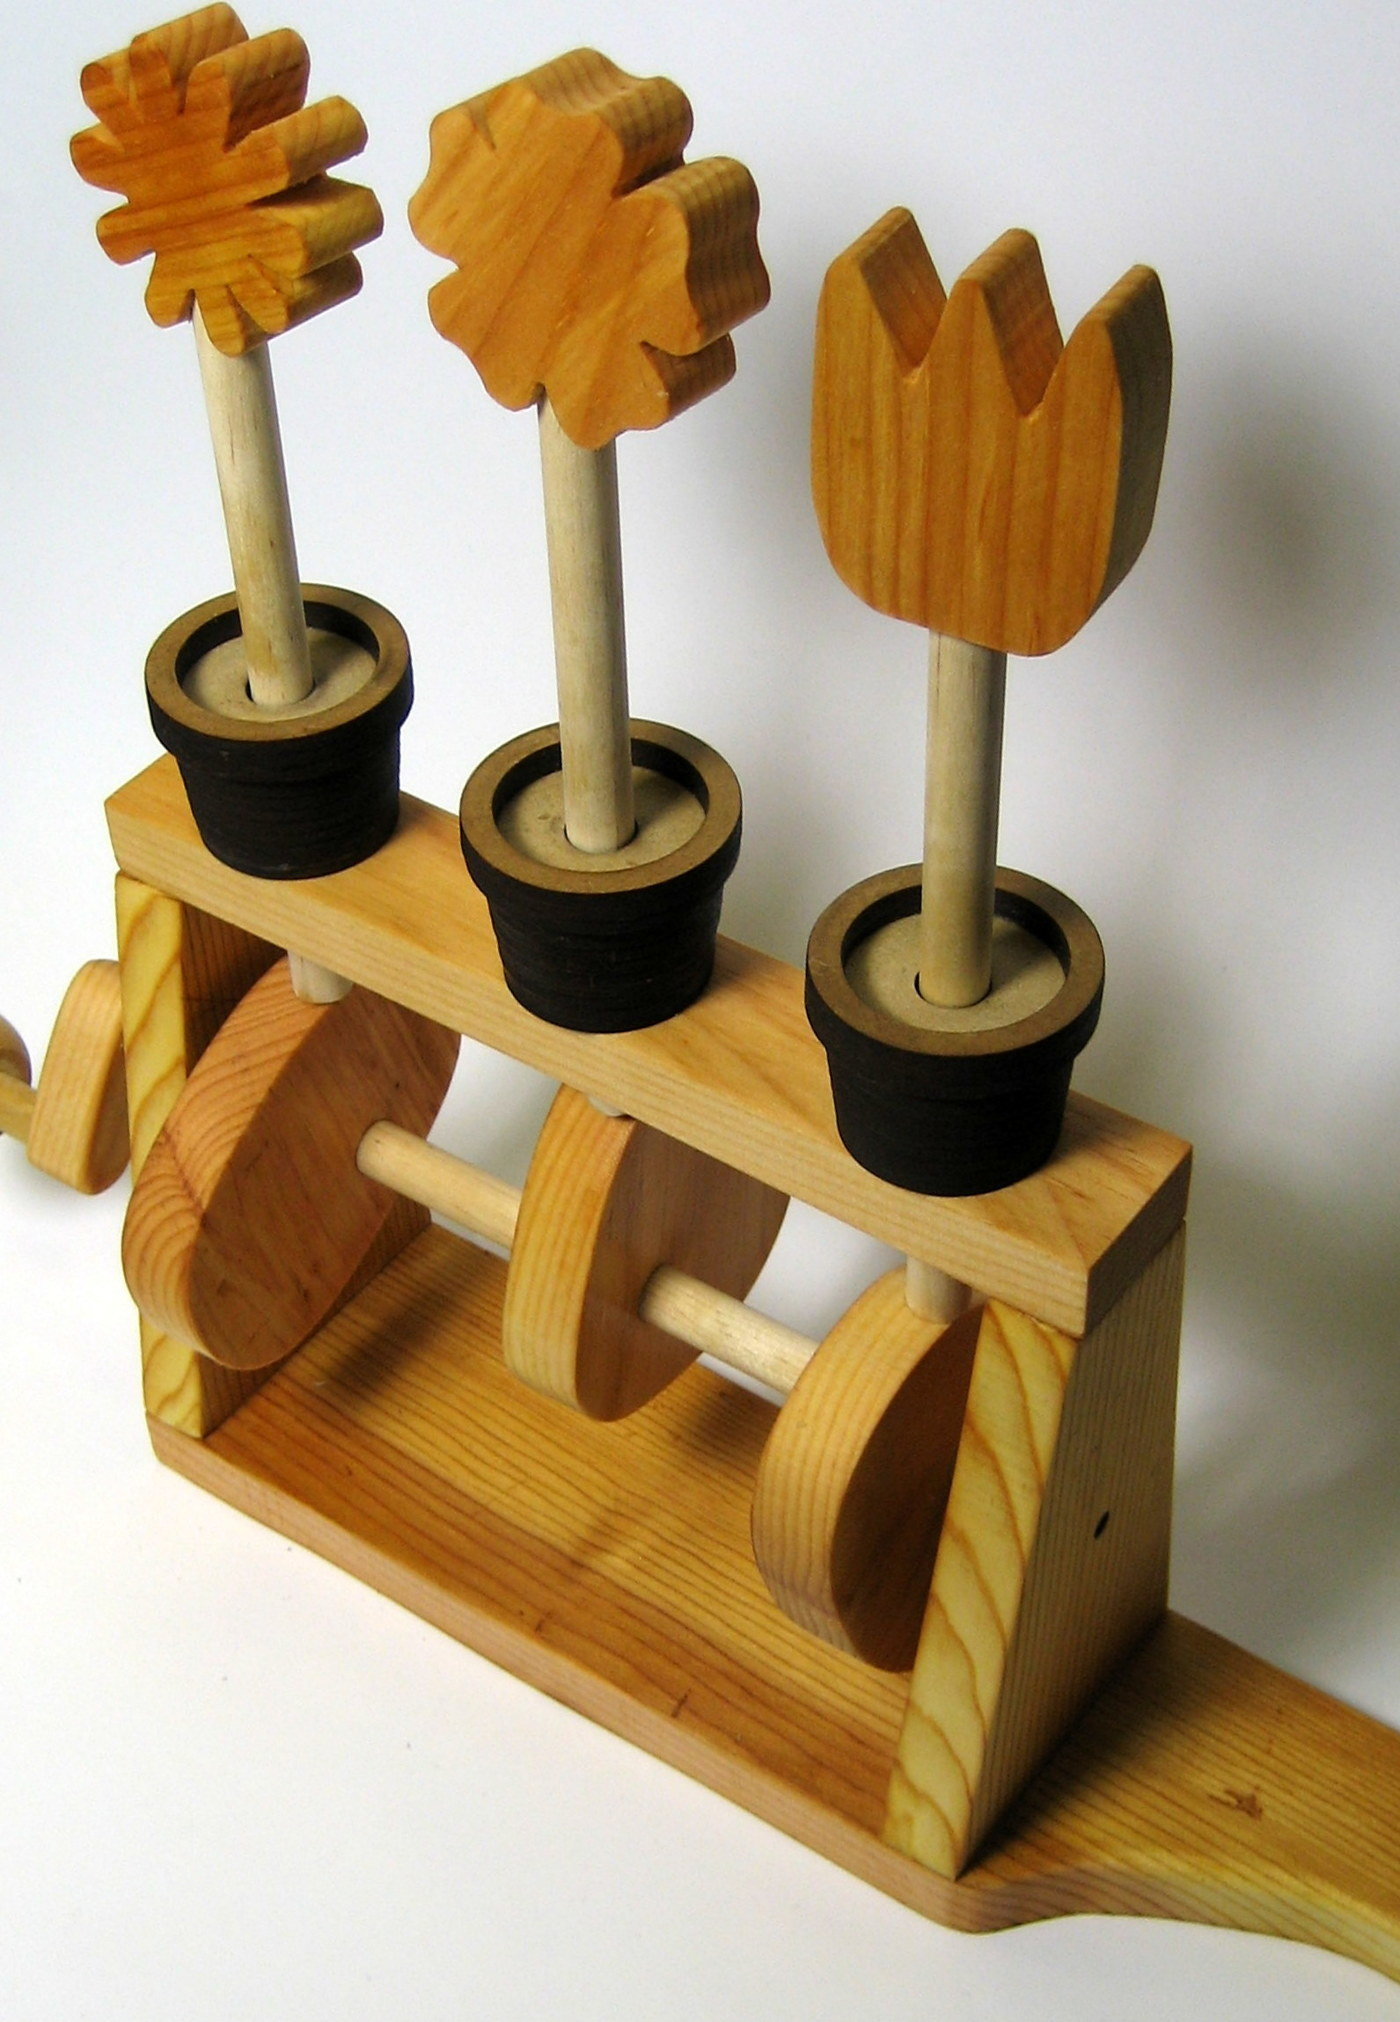 Laser Cut Wood Toys